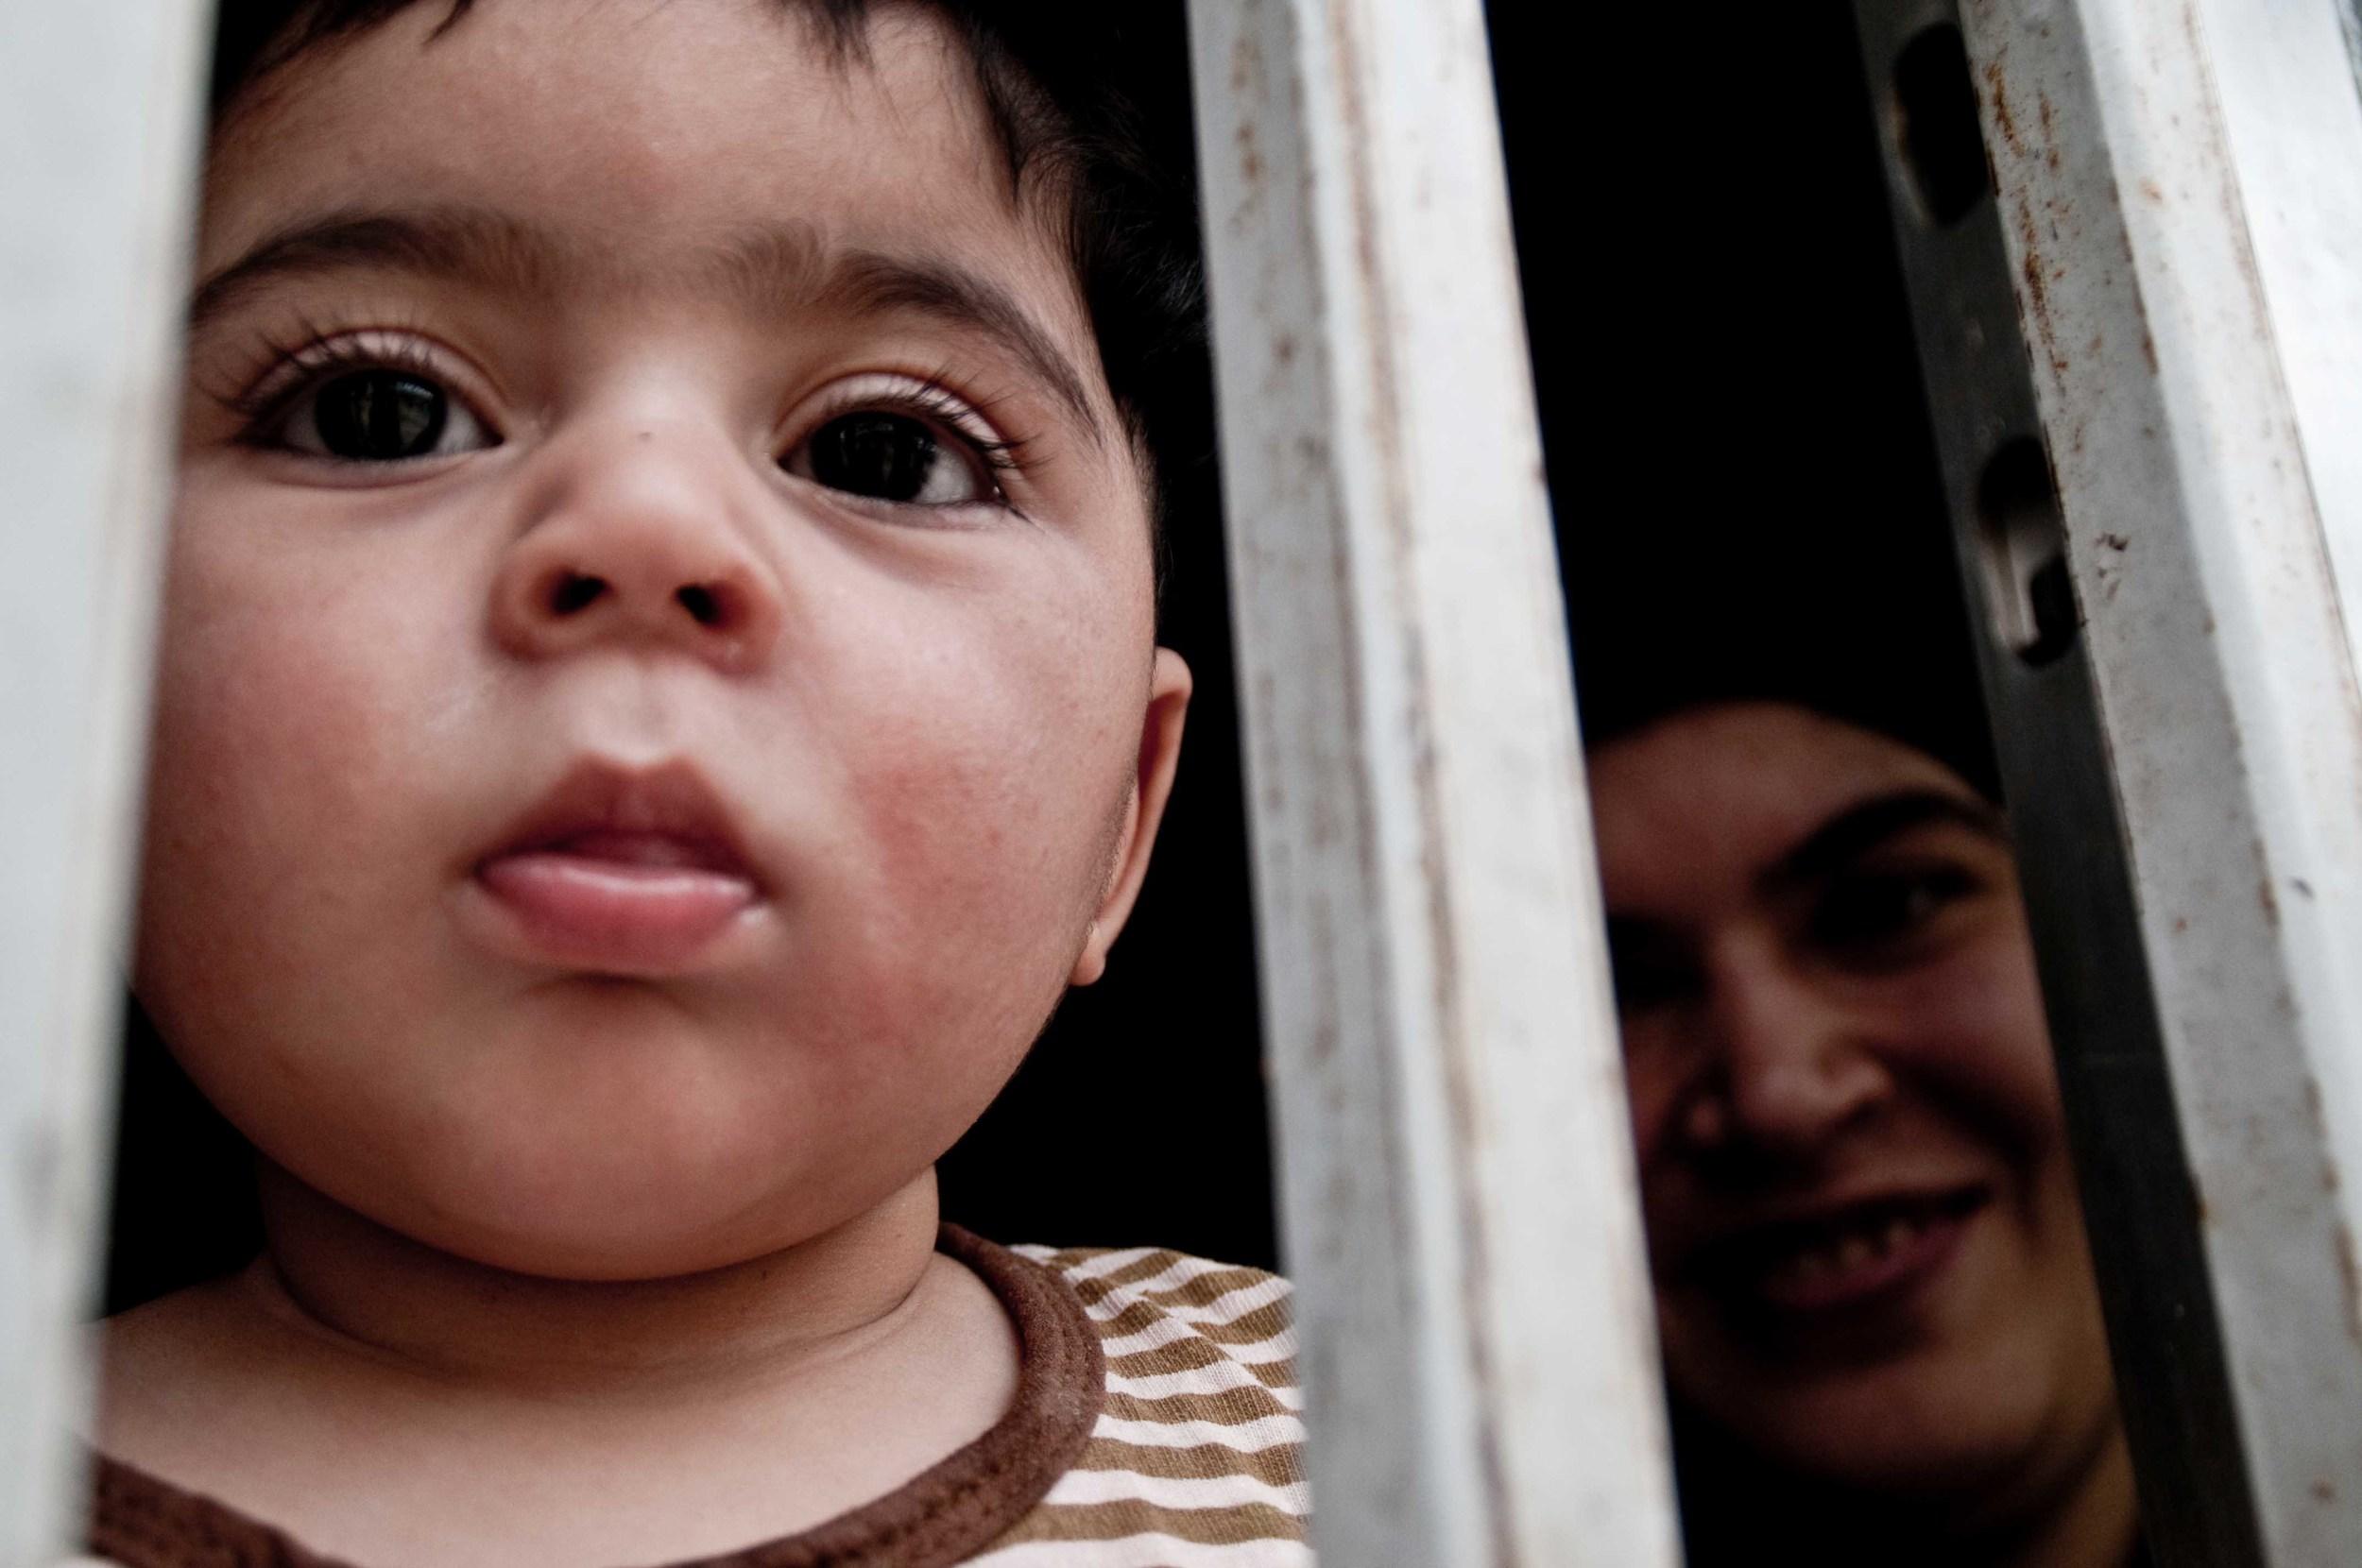 Lebanon_607.jpg